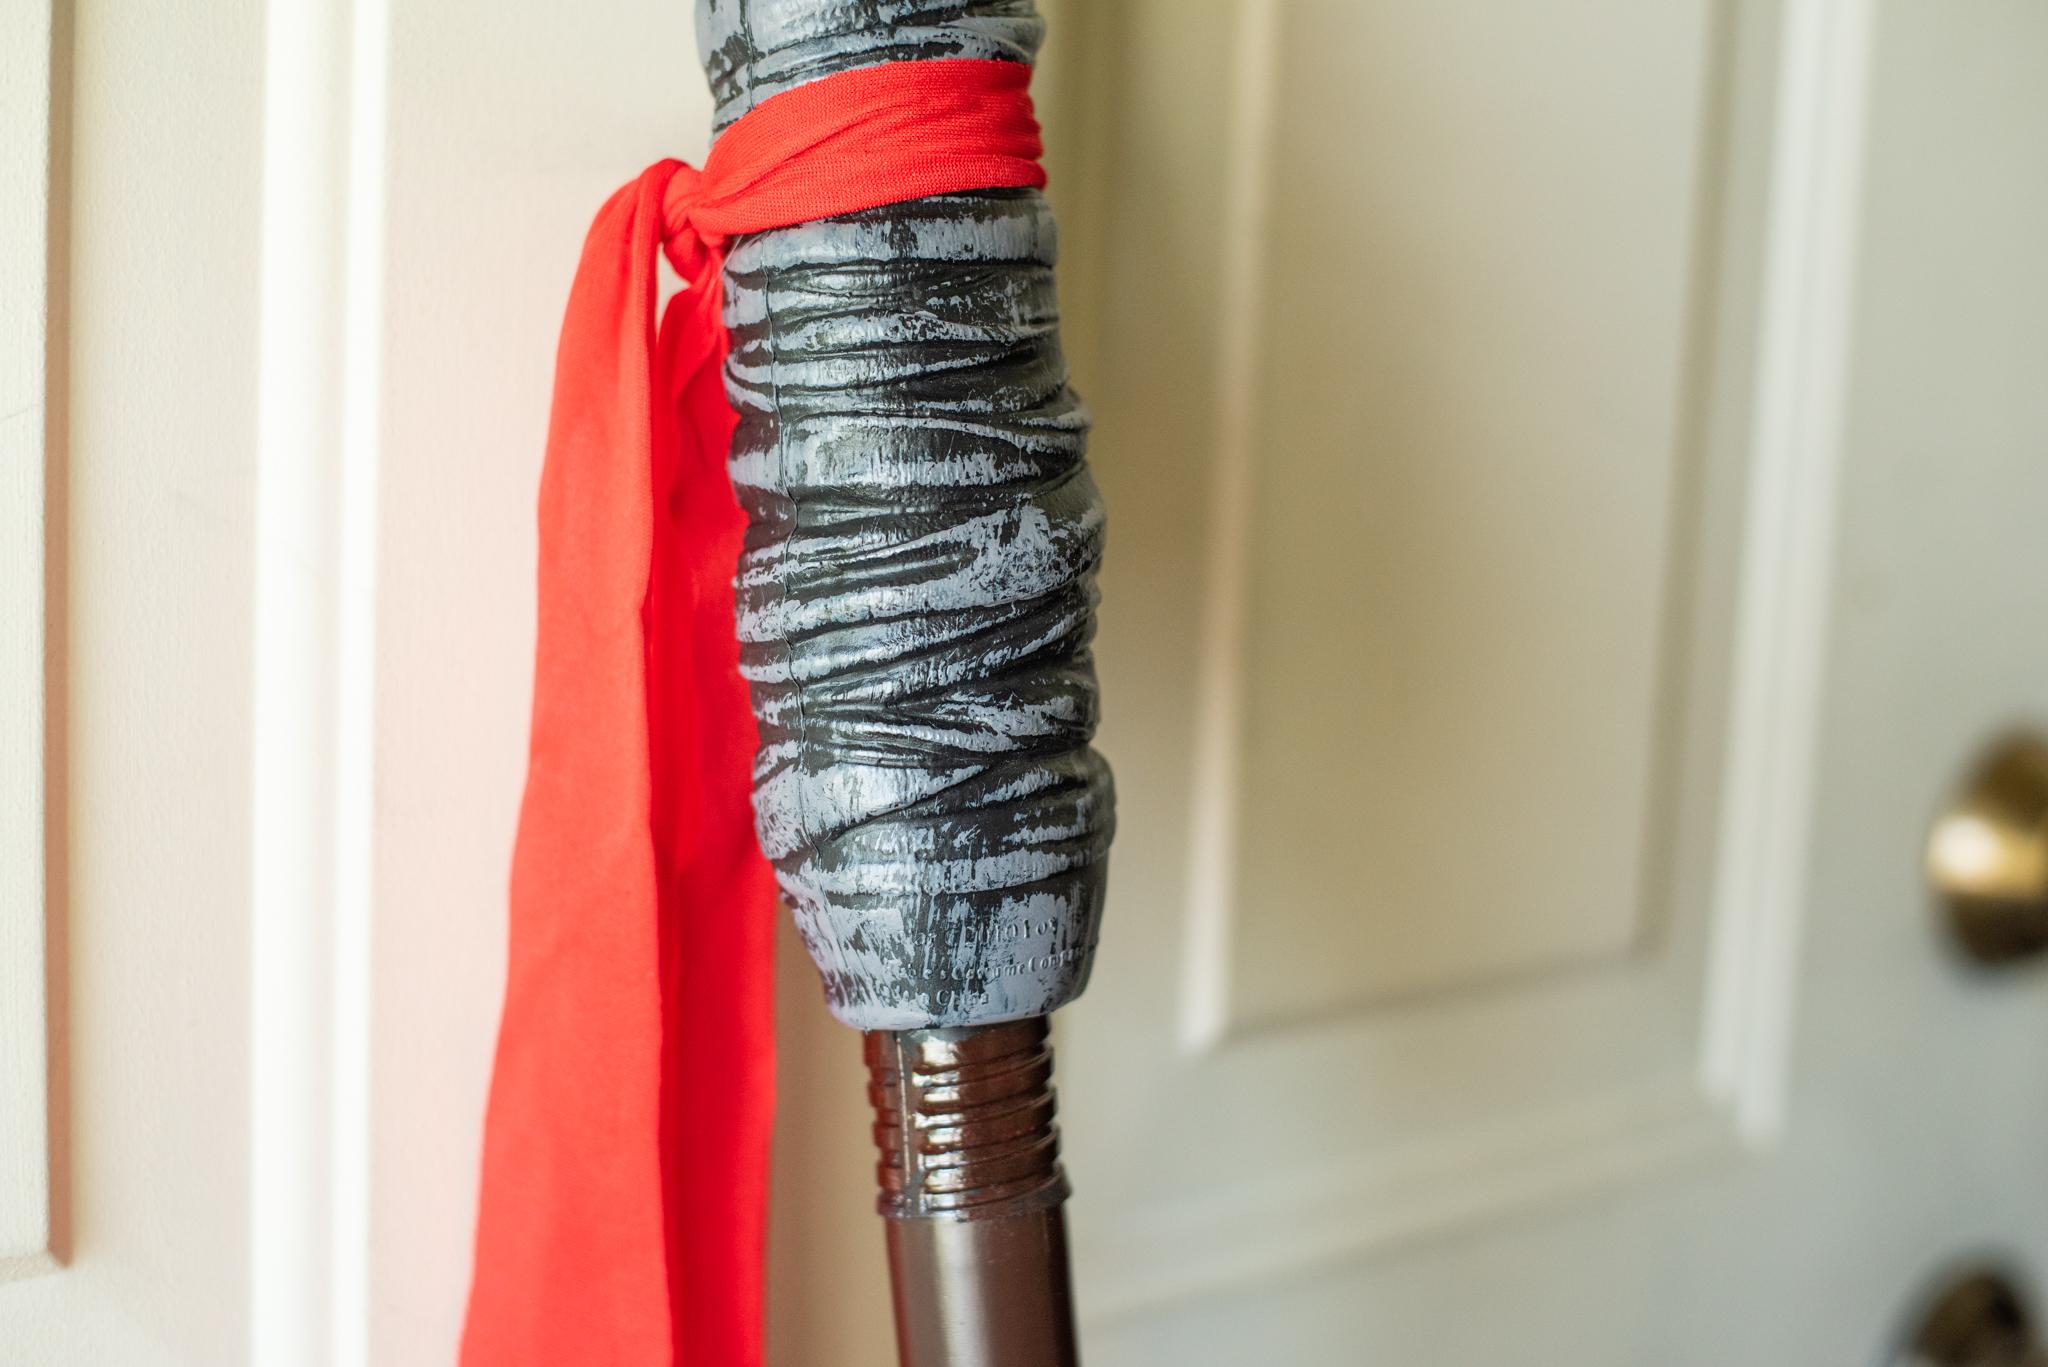 Original Spear Wrap & Handle